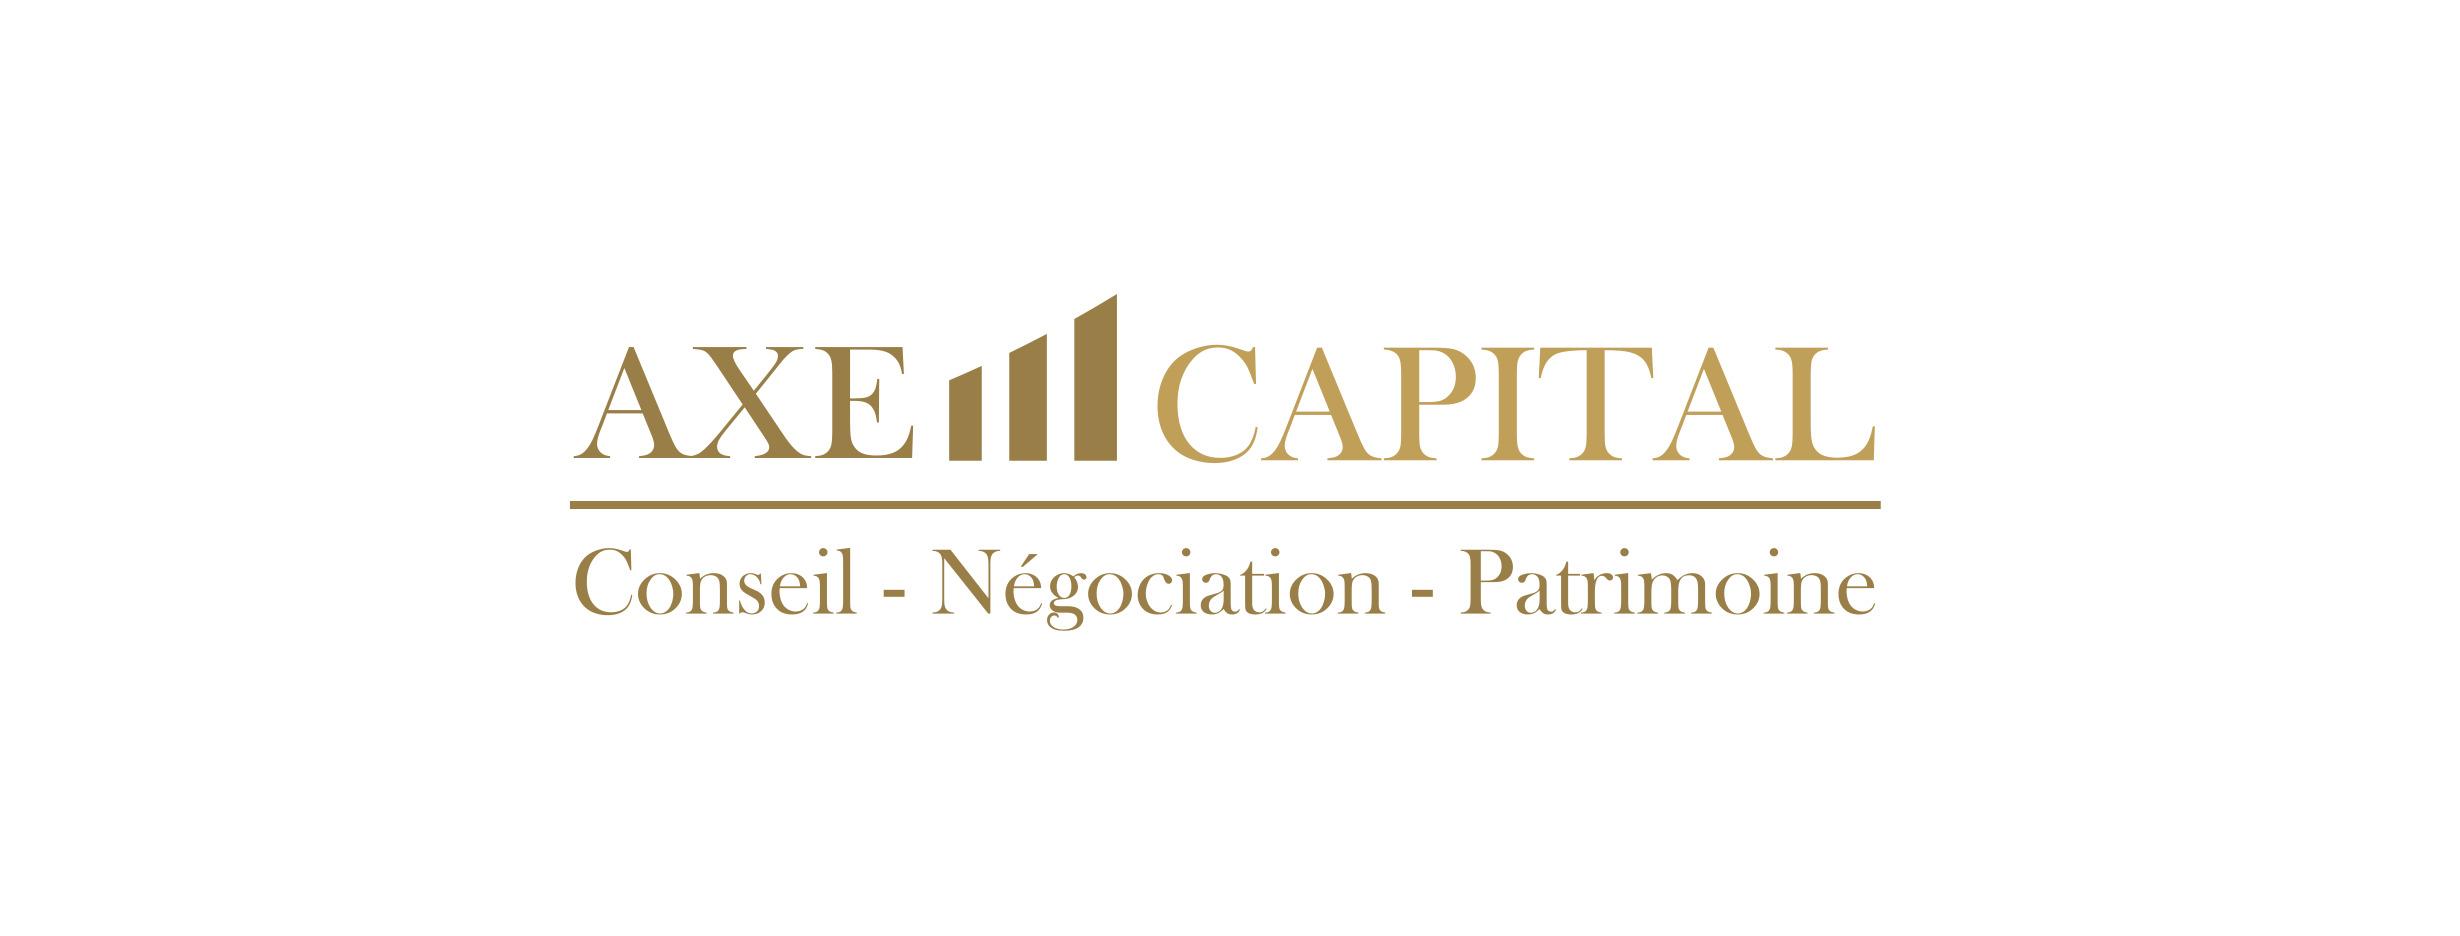 AXE CAPITAL - CONSEIL NEGOCIATION & PATRIMOINE agence immobilière